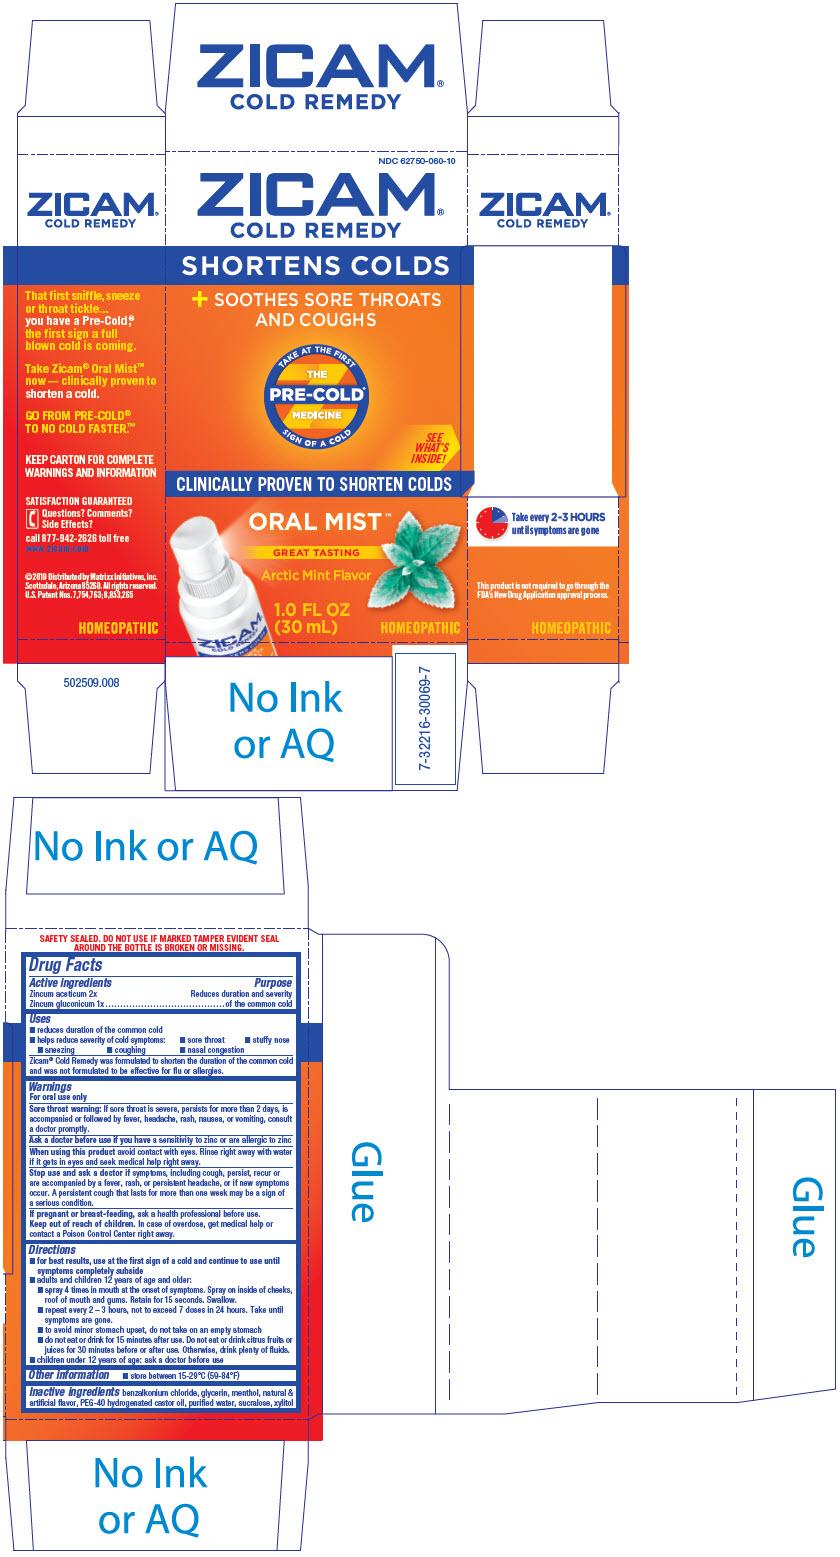 Zicam Cold Remedy Oral Mist (Zinc Acetate And Zinc Gluconate) Spray [Matrixx Initiatives, Inc.]